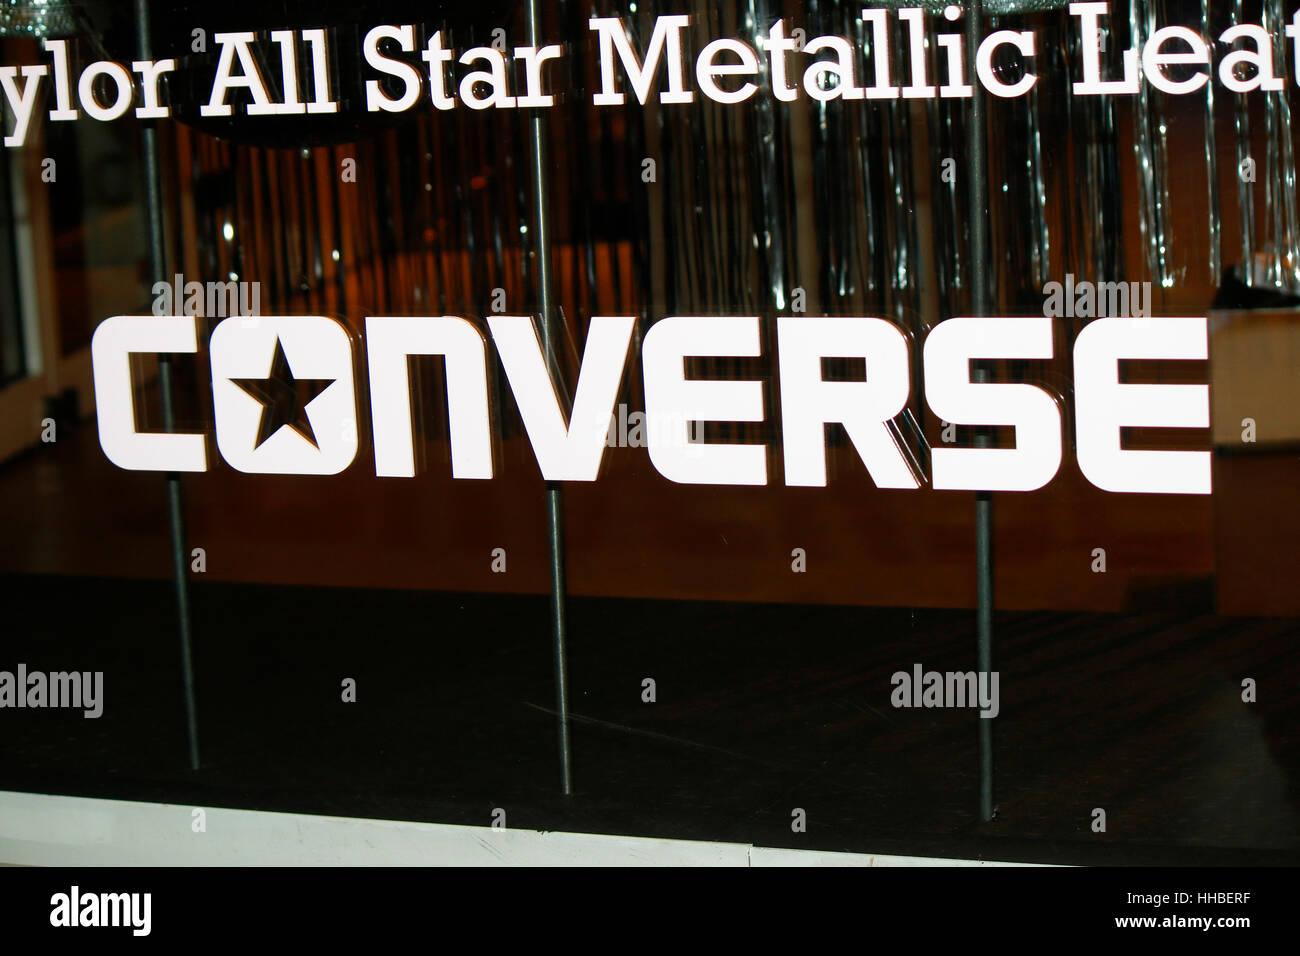 das Logo der Marke 'Converse', Berlin. - Stock Image